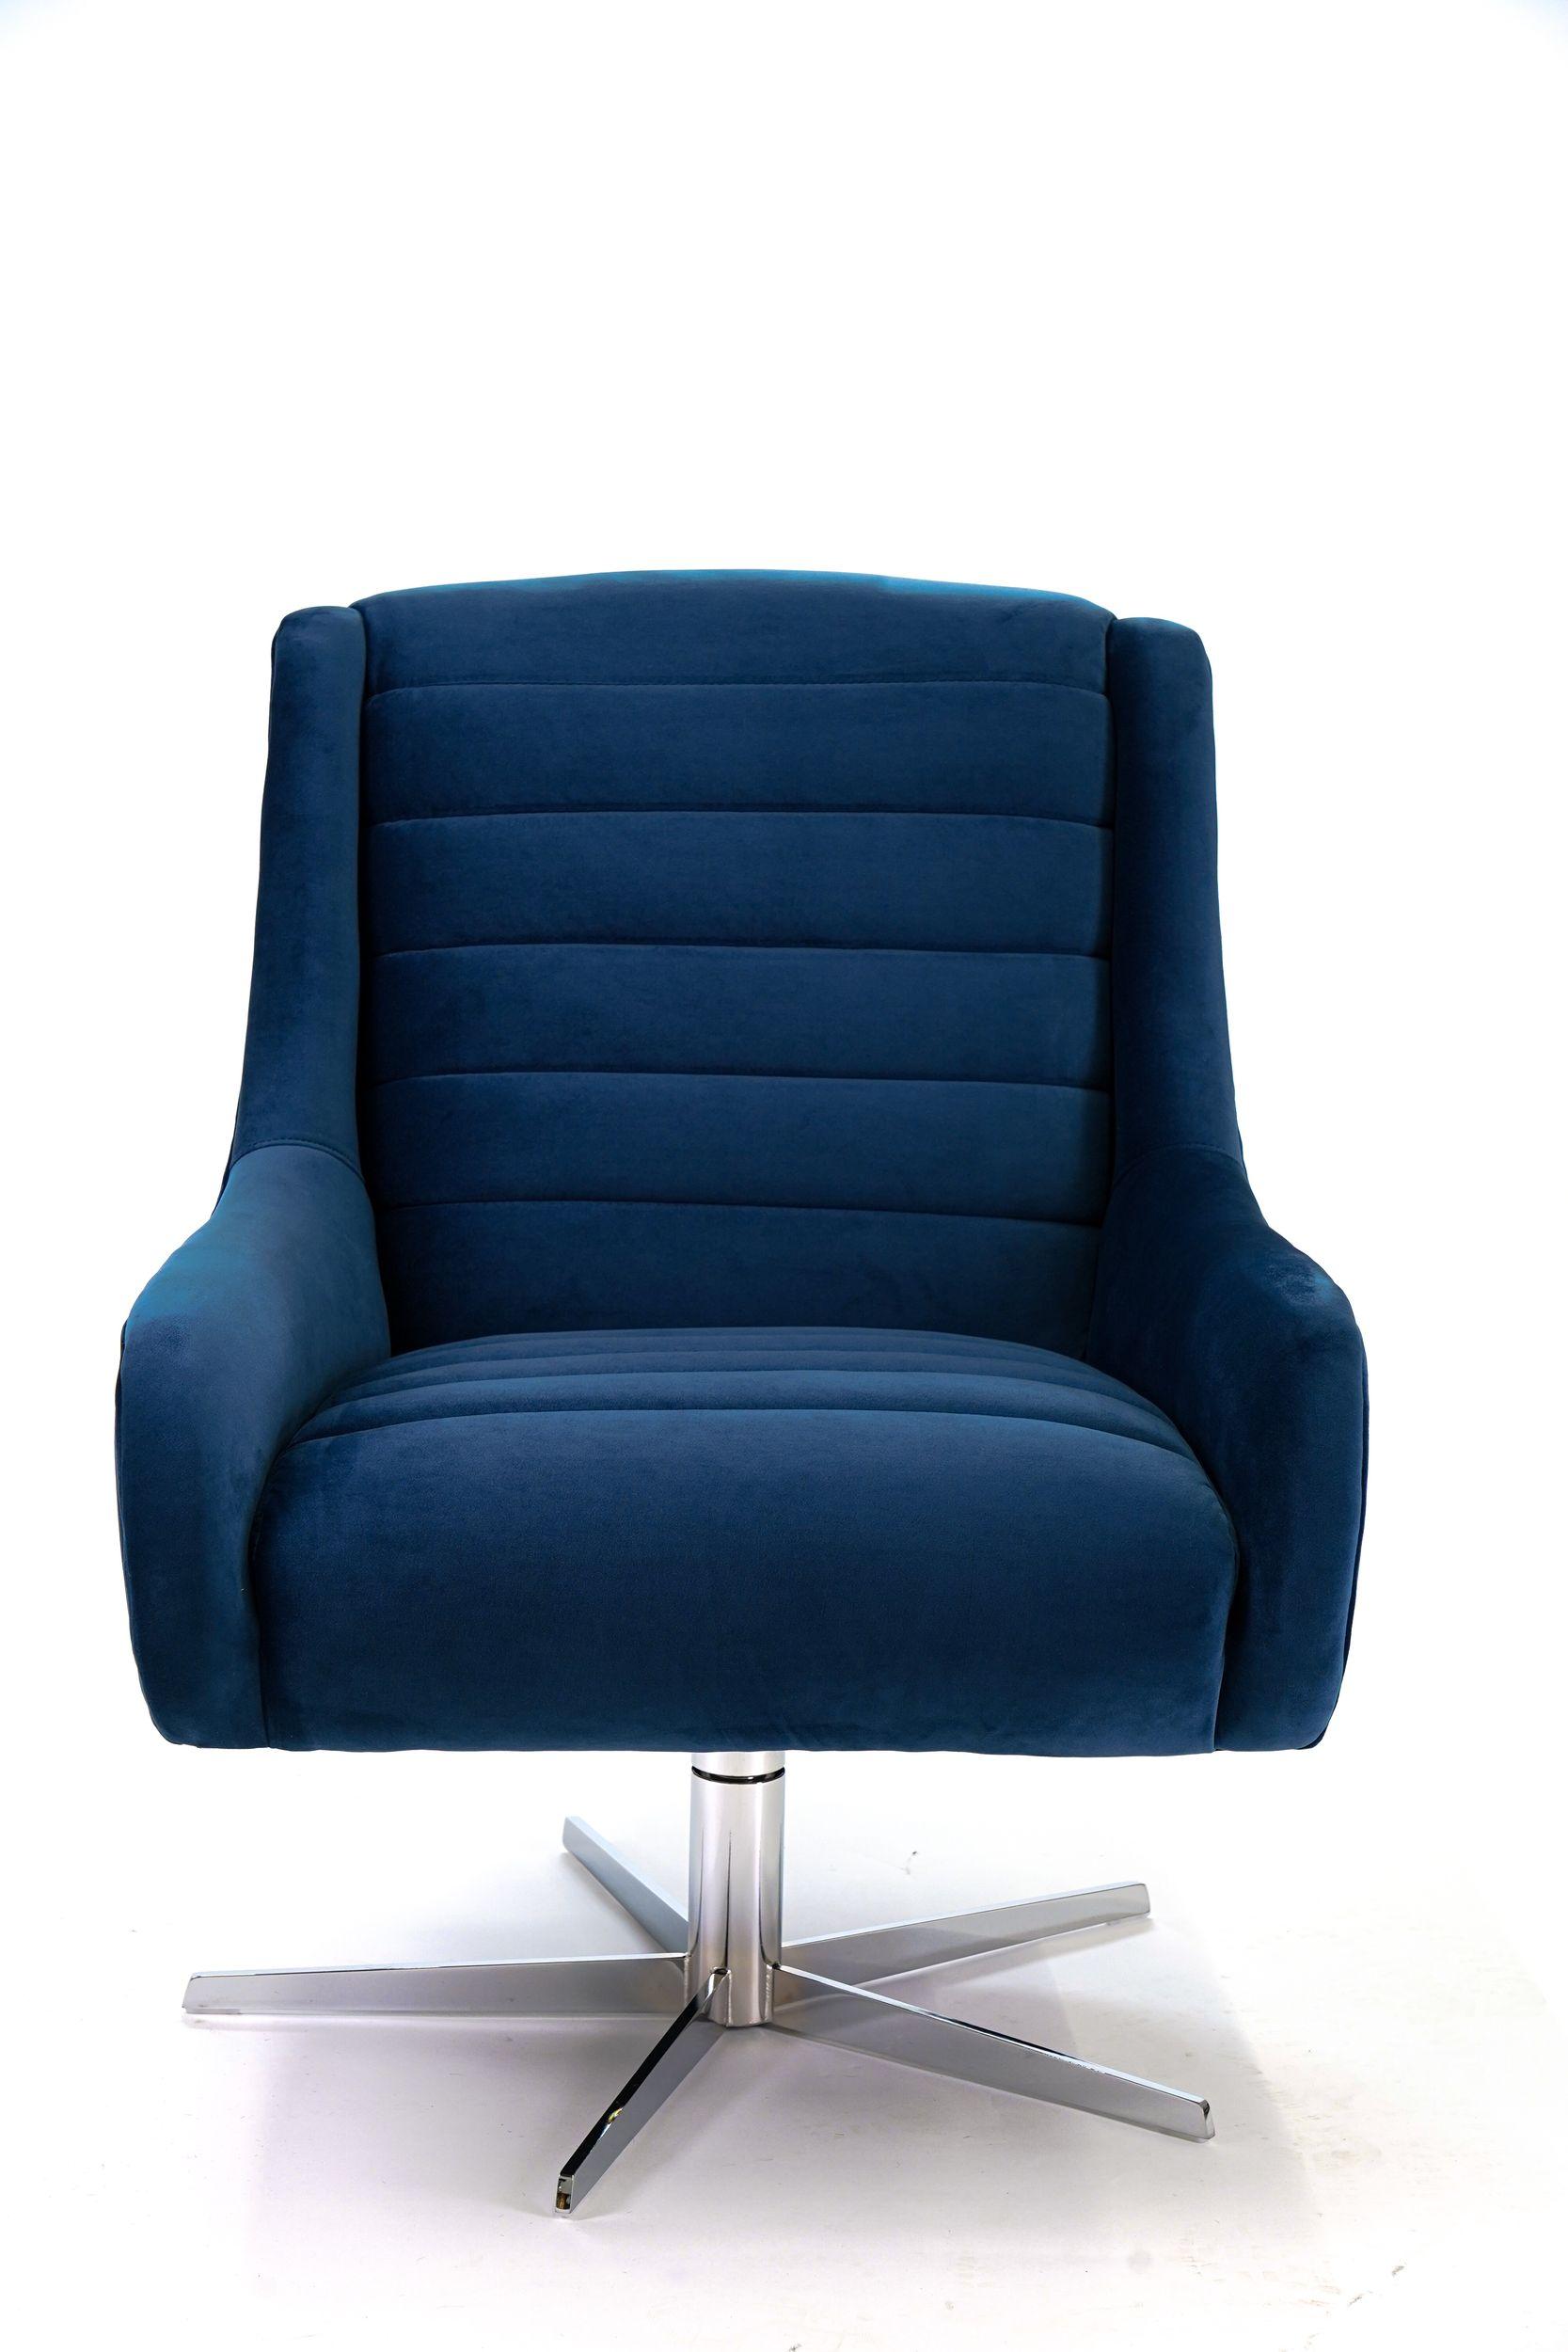 Кресло Tribeca 0.89x0.72x0.87м